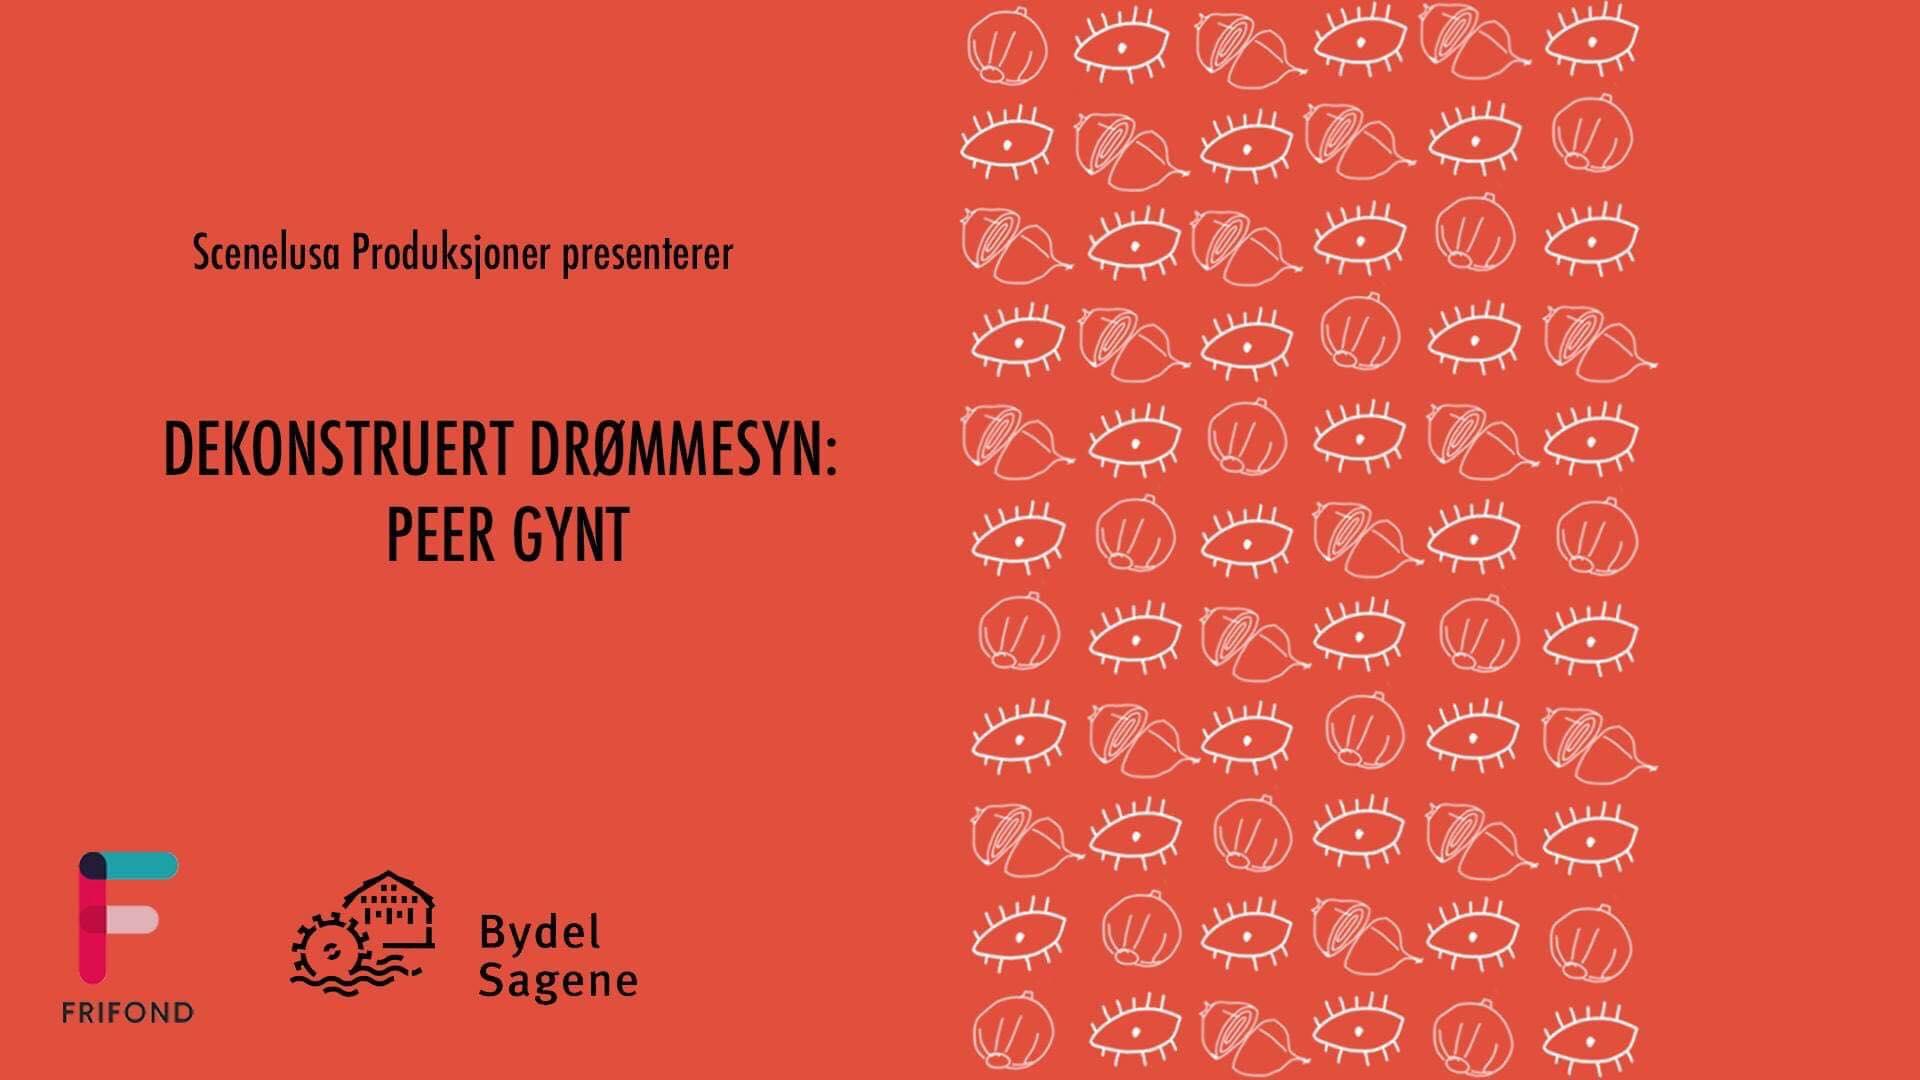 dekonstruert drømmesyn: Peer Gynt -